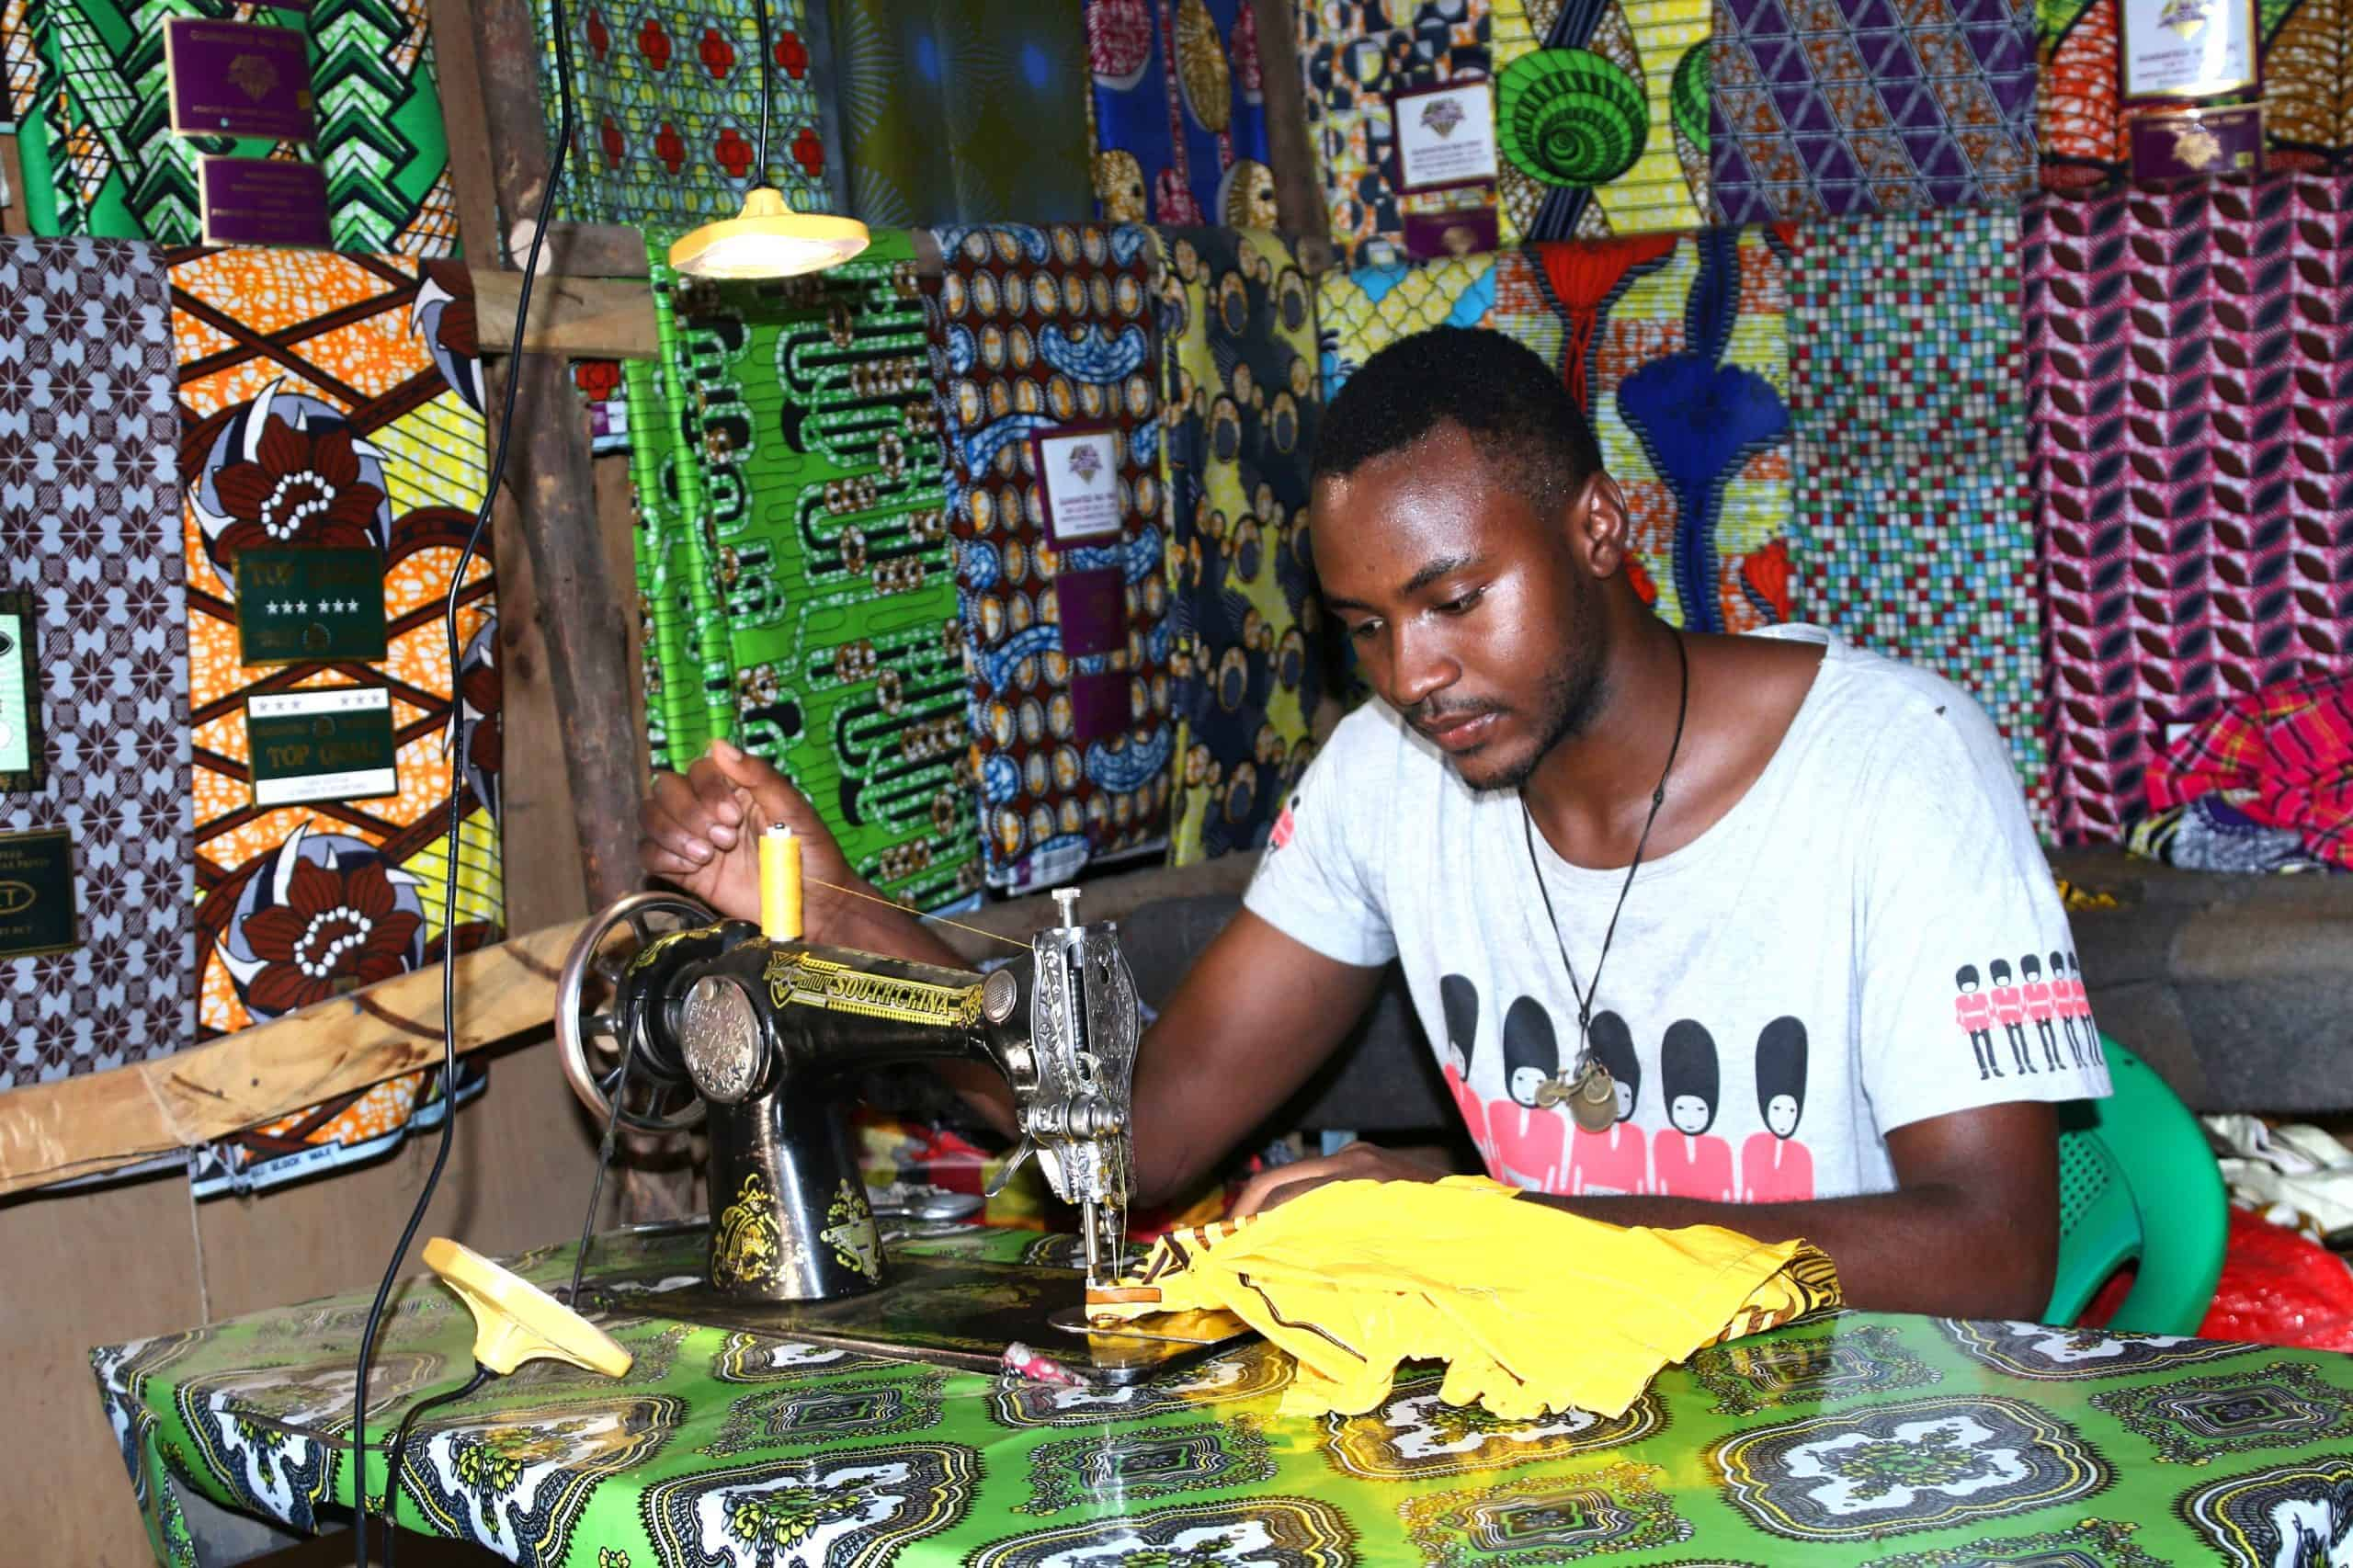 A man using a sewing machine